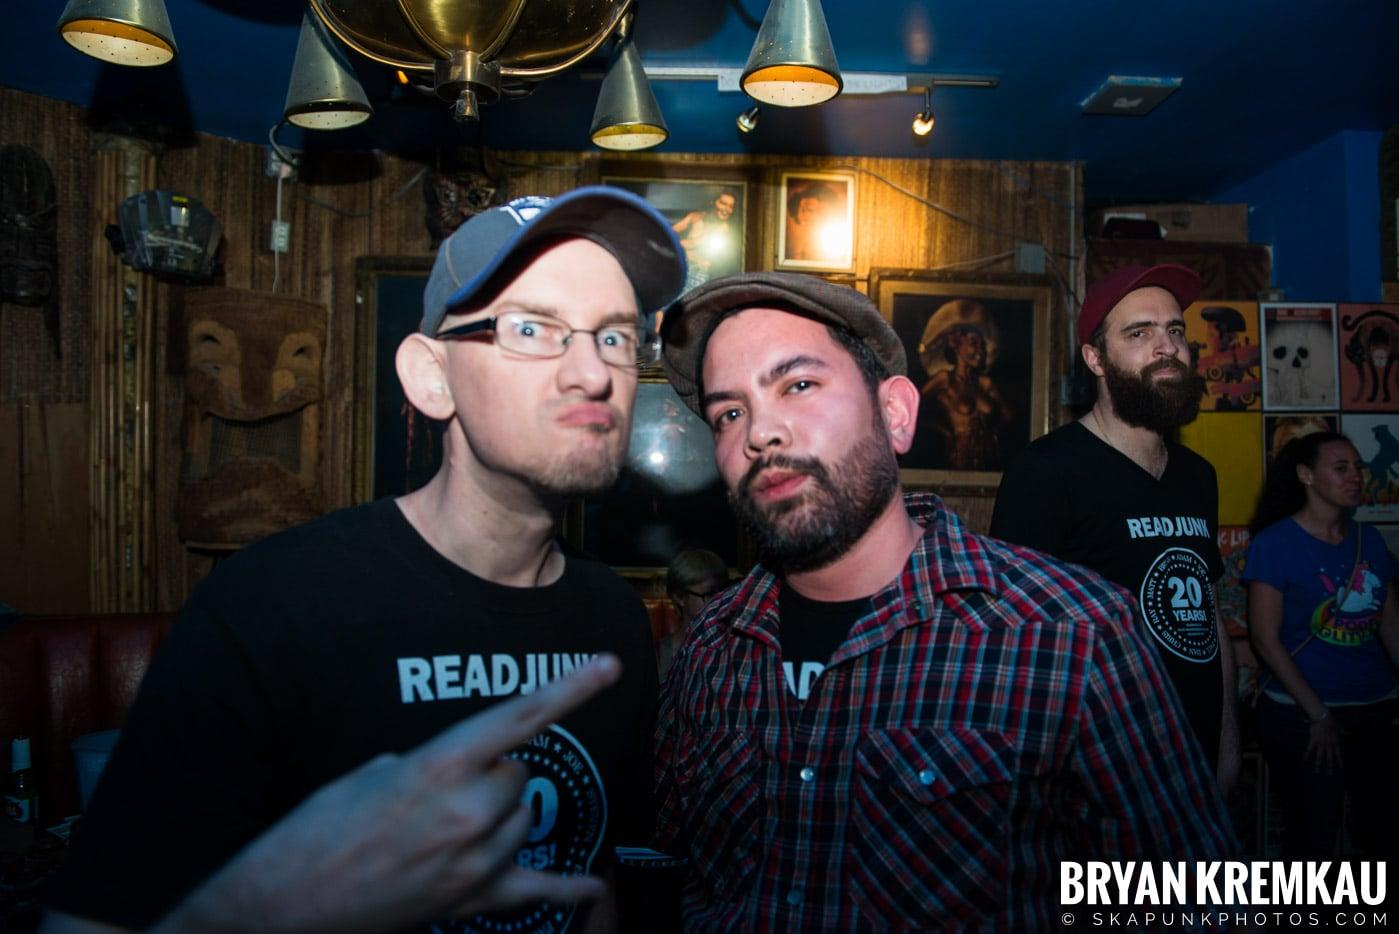 ReadJunk.com 20th Anniversary Party @ Otto's Shrunken Head, NYC - 4.29.17 (28)